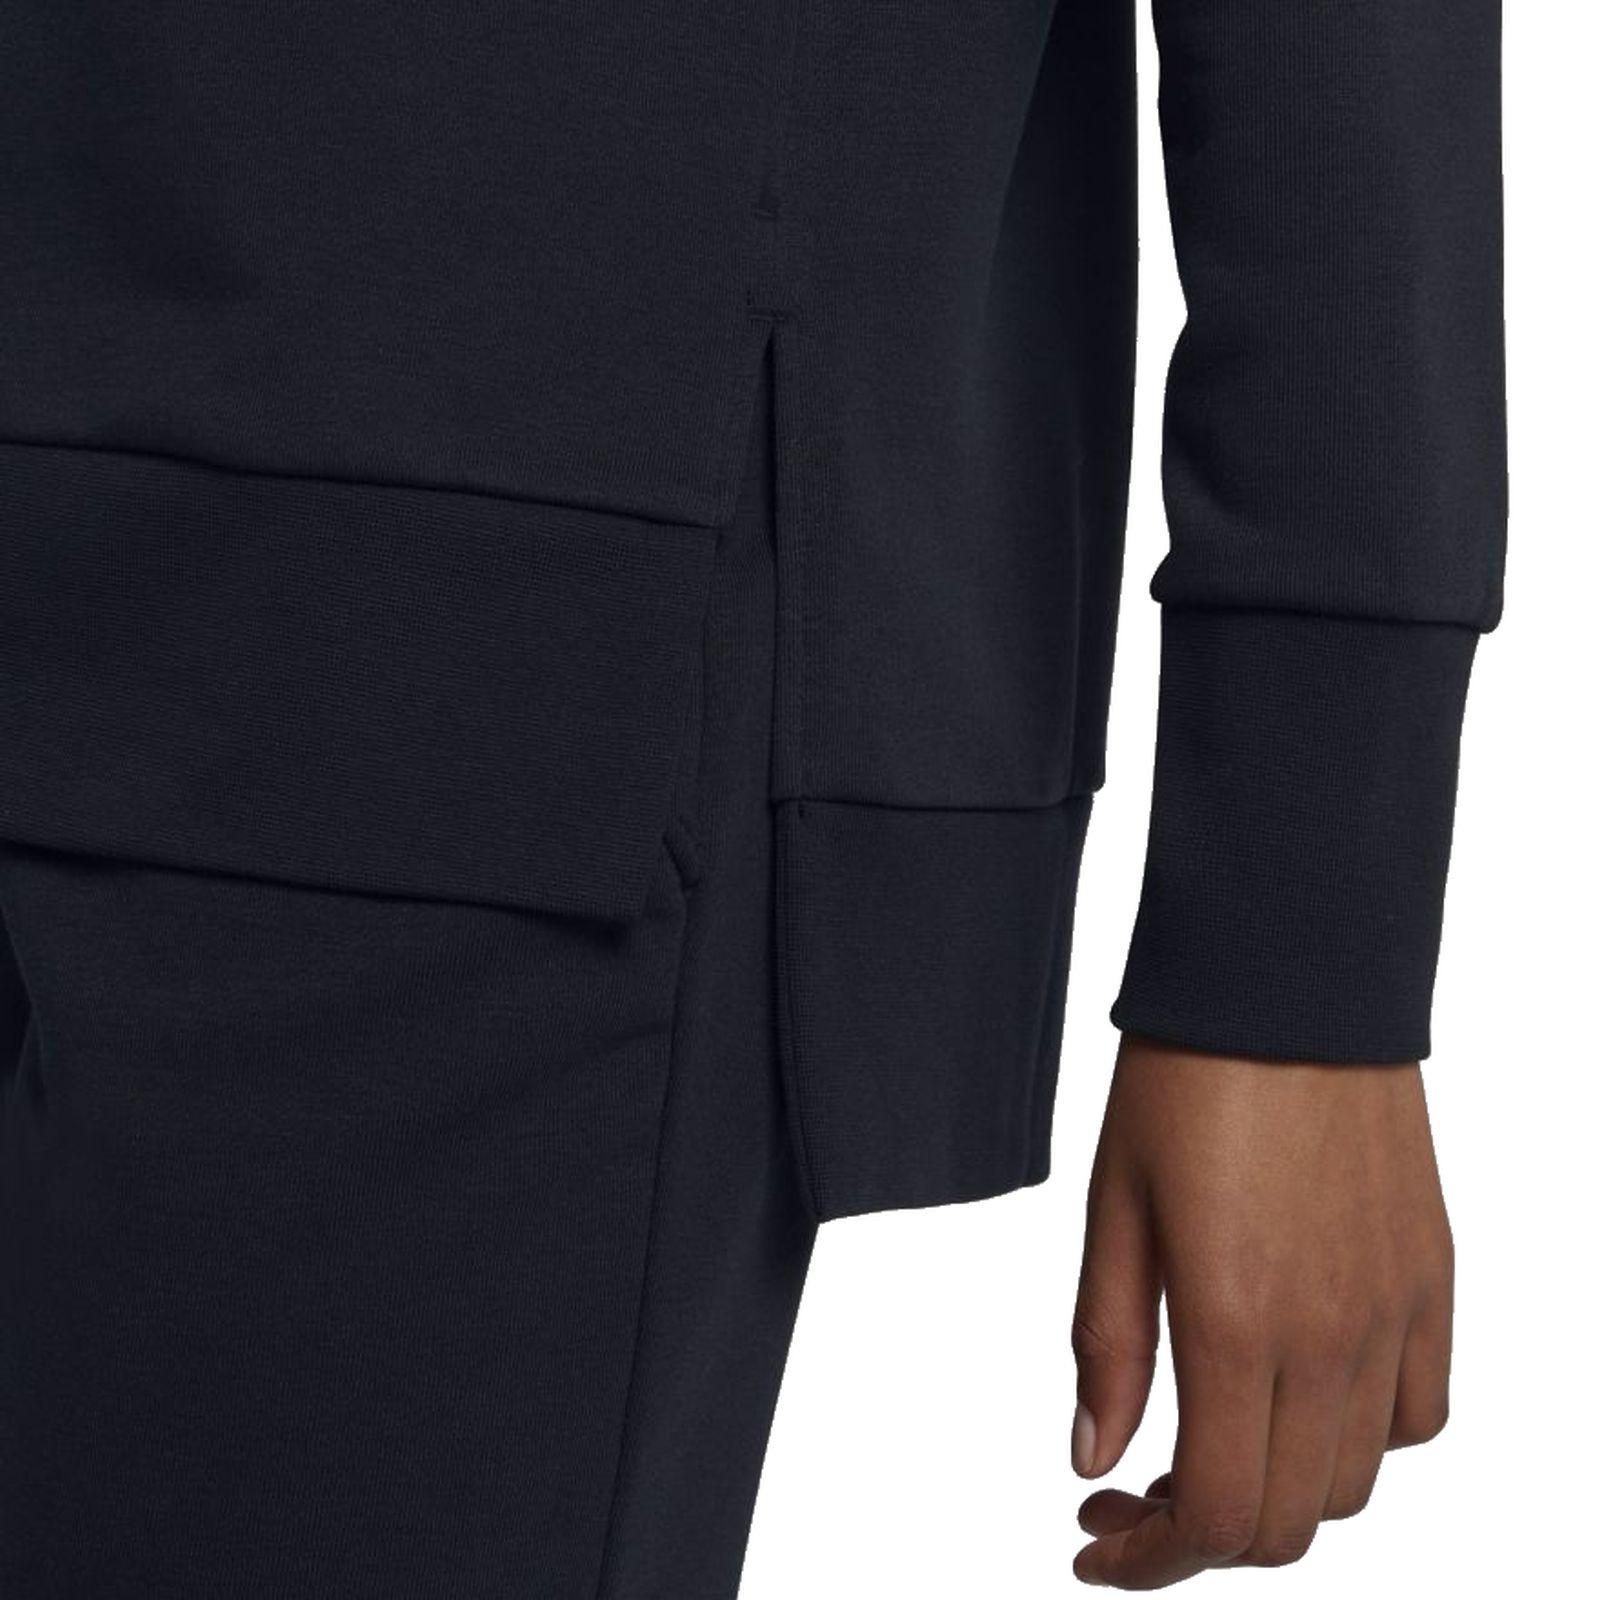 Details about Nike Women's Sports Fitness Hoody Sweater Jacket W NK Dry Hoodie Fz Black